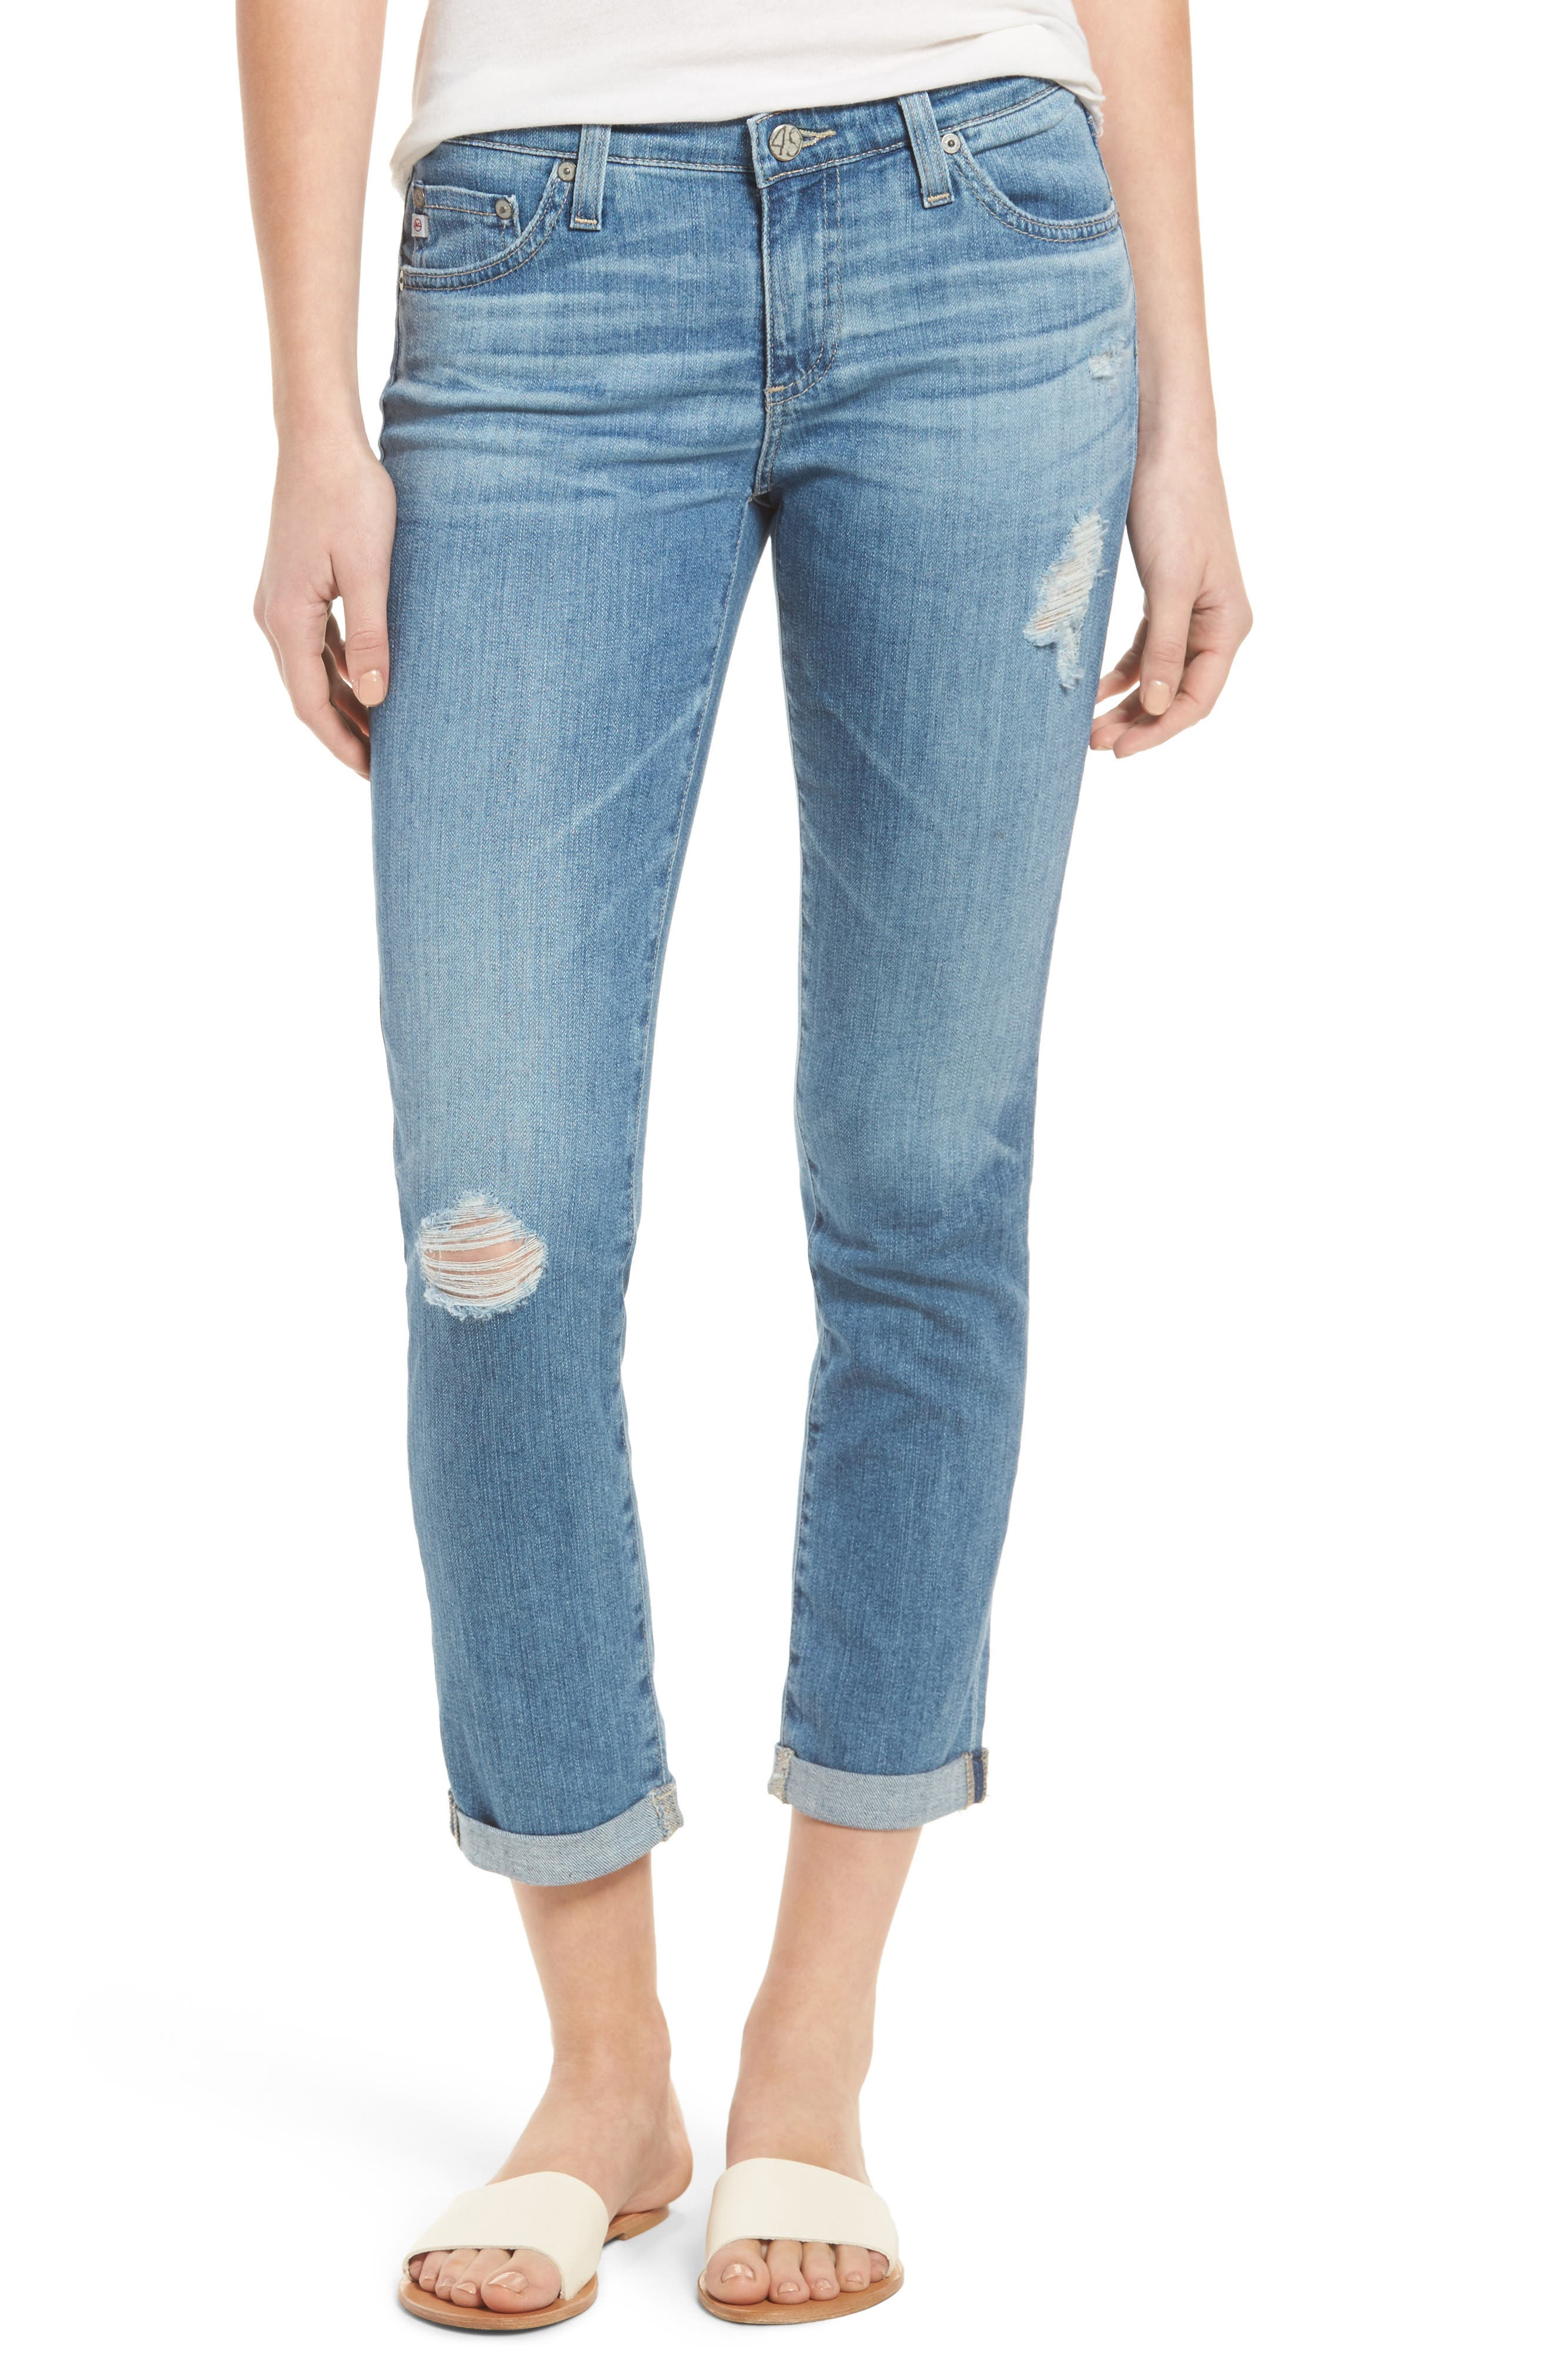 AG, 'Stilt' Distressed Roll Cuff Cigarette Jeans, Main thumbnail 1, color, 403